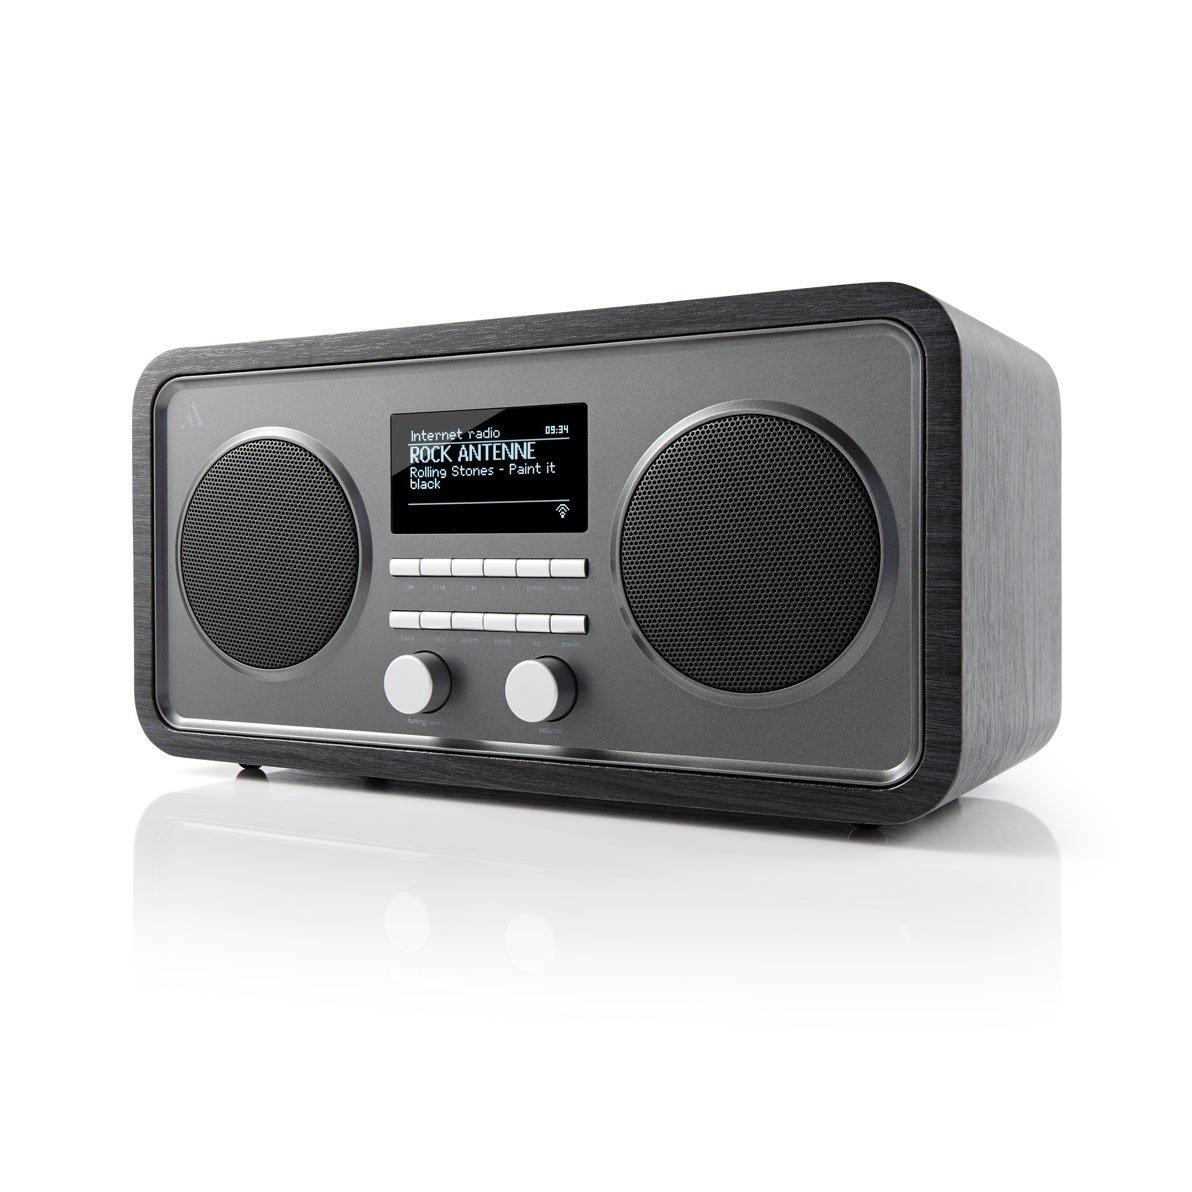 Argon Audio Radio 3i DAB+/FM/Internet mit Bluetooth und Spotity Connect